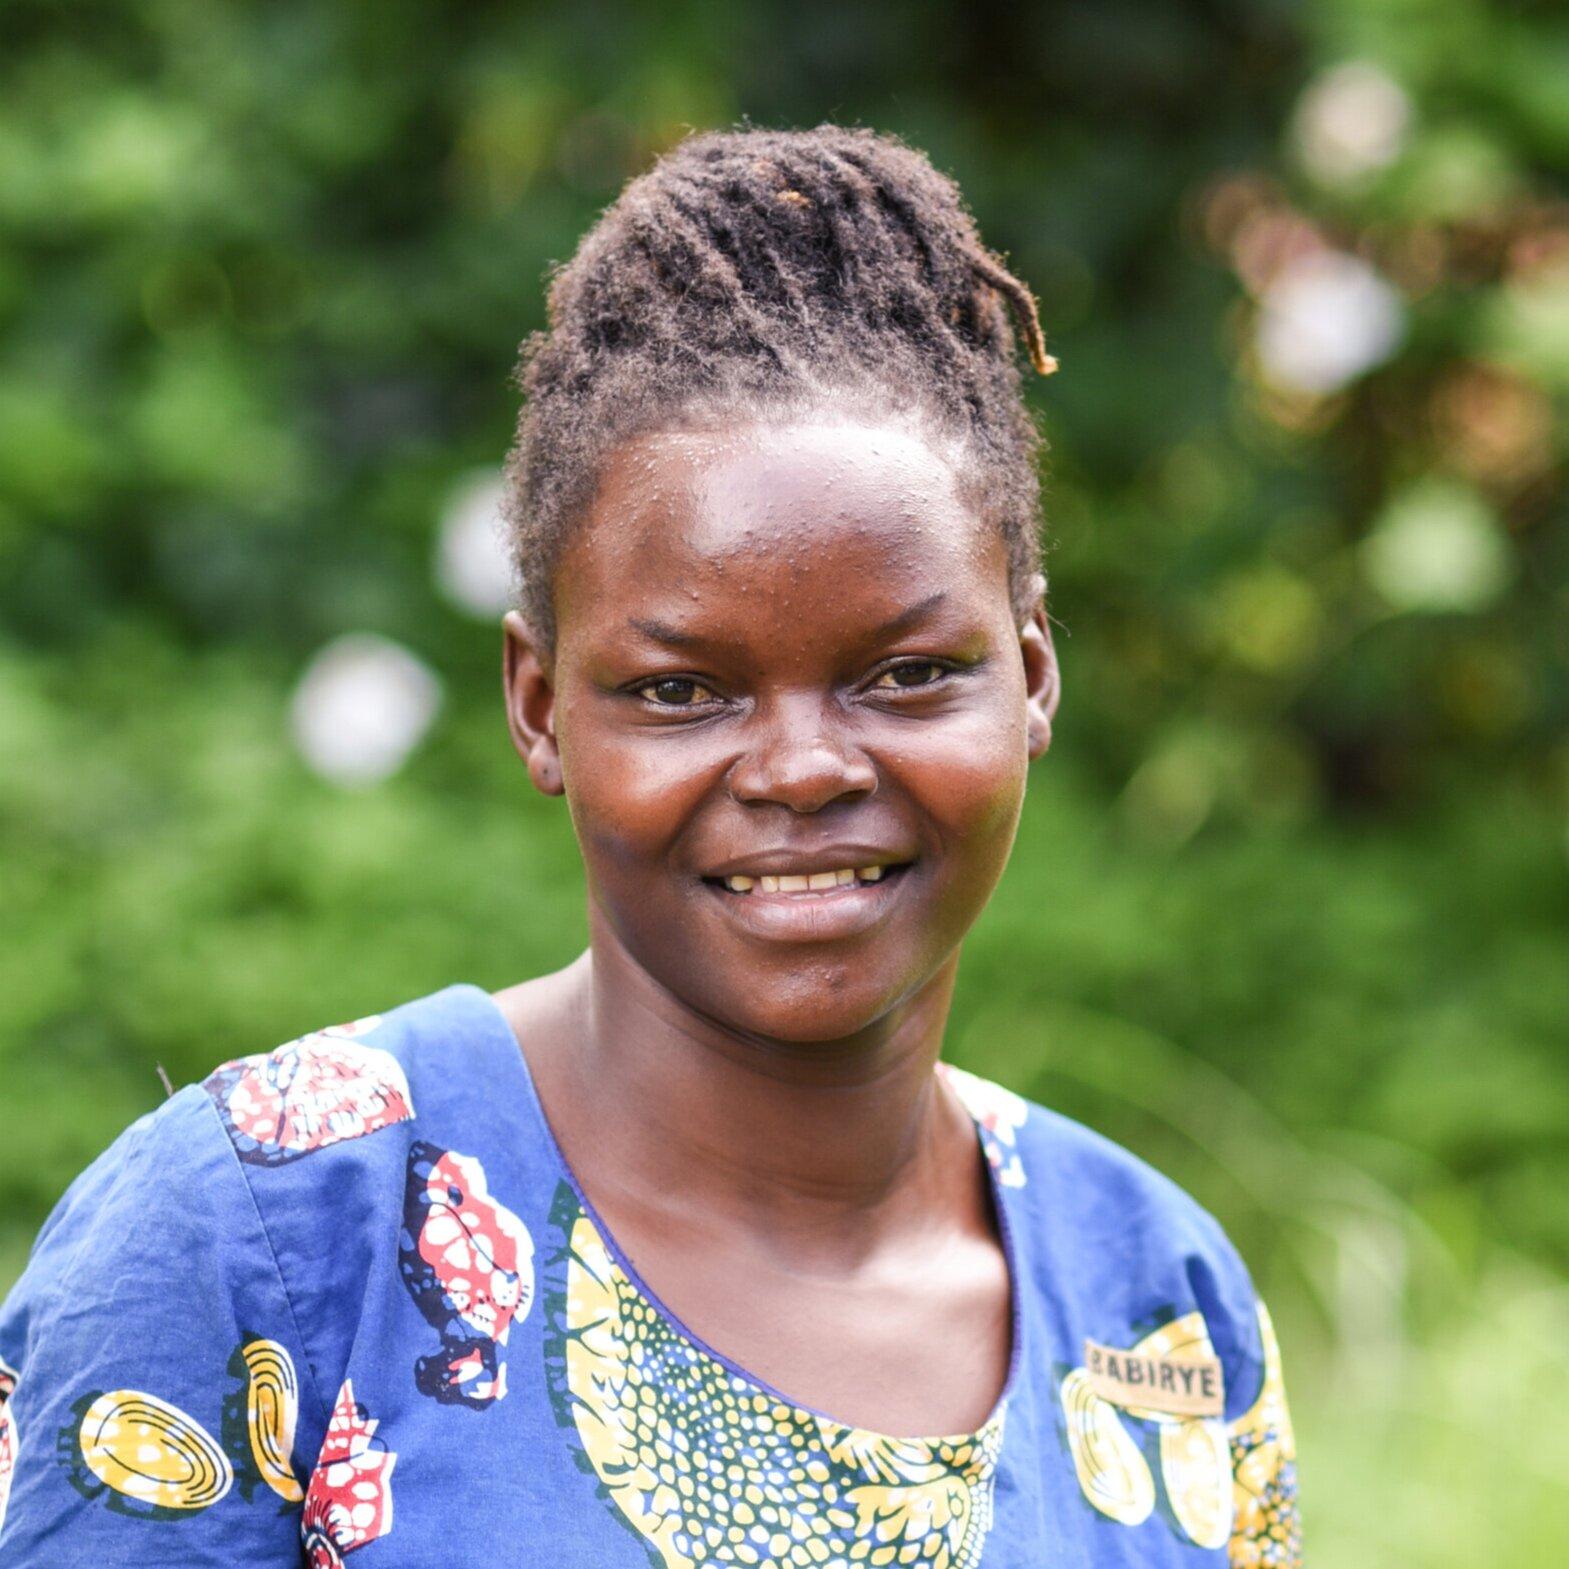 Babirye - Supervisor of Nutrition/Cook